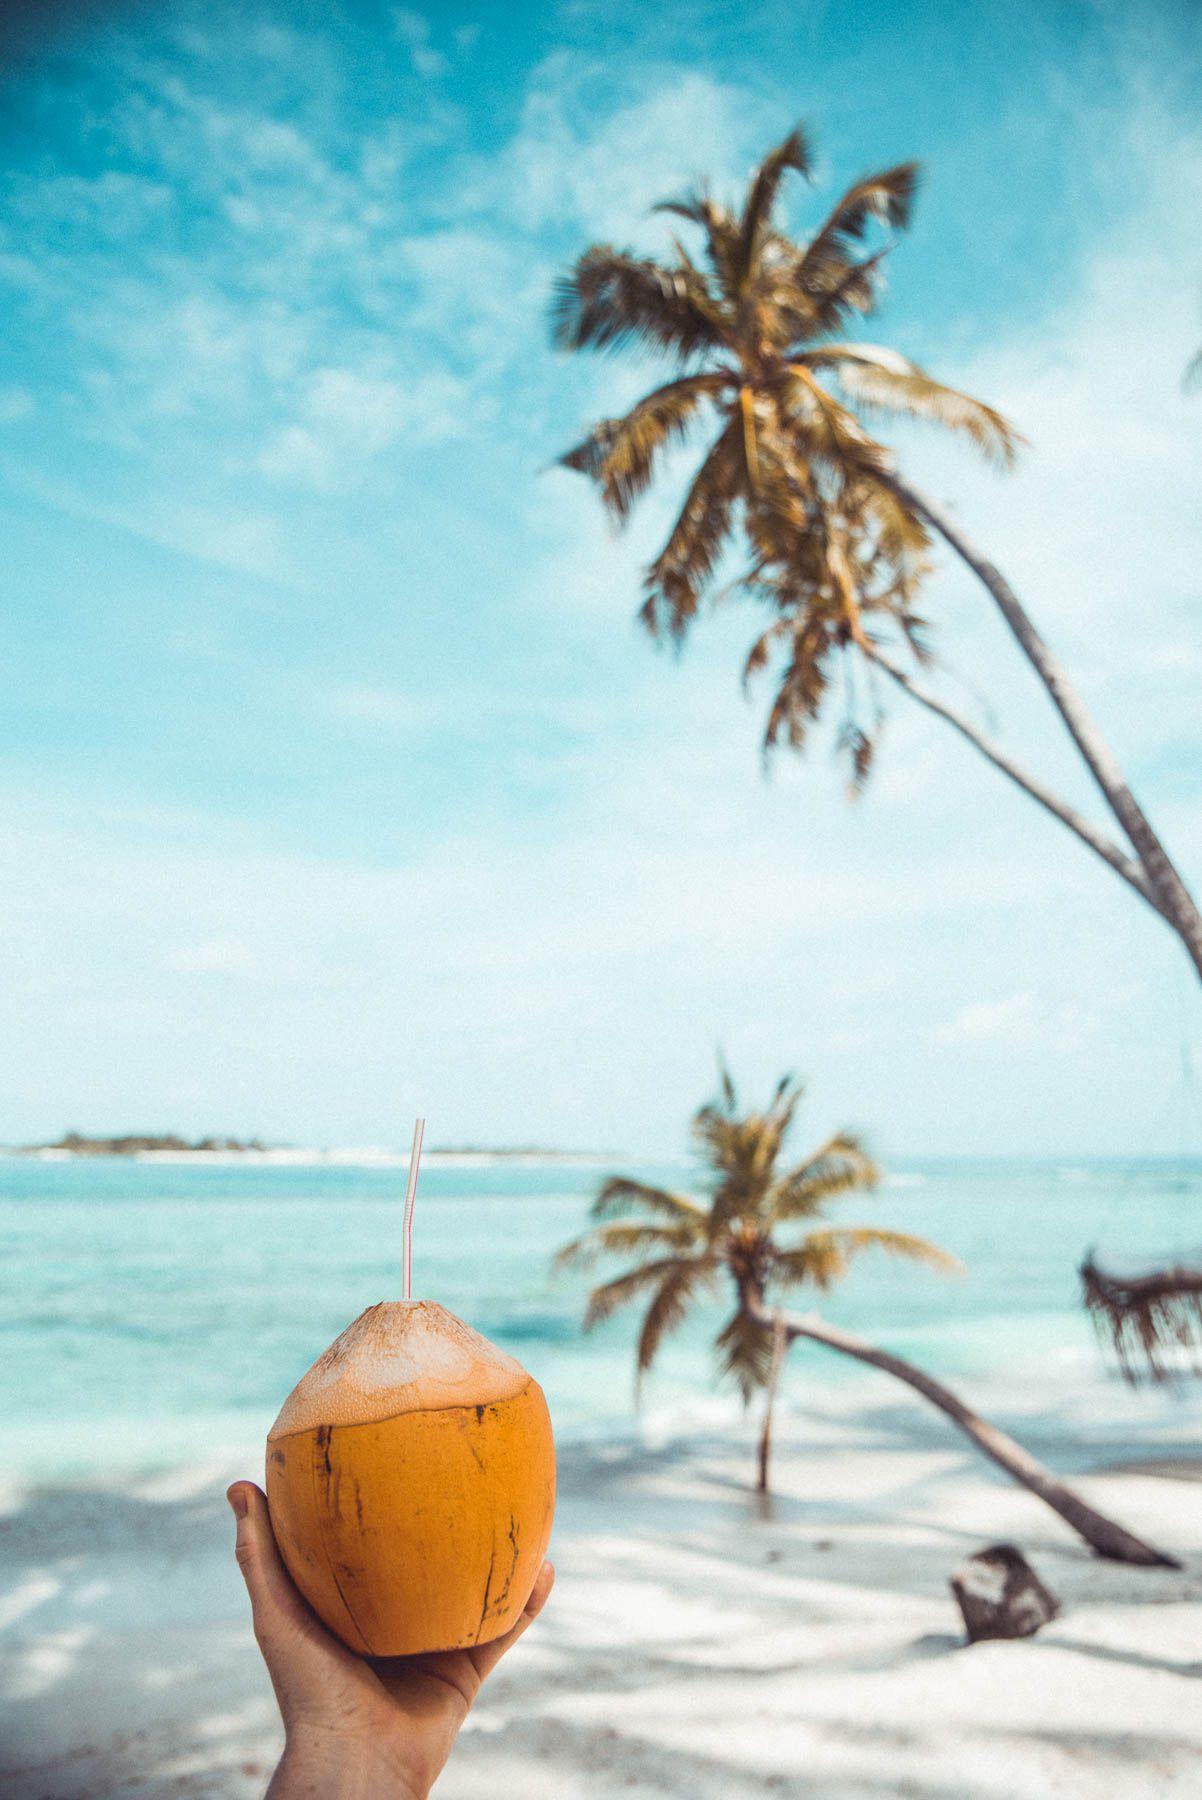 Best Beach Quotes 2020